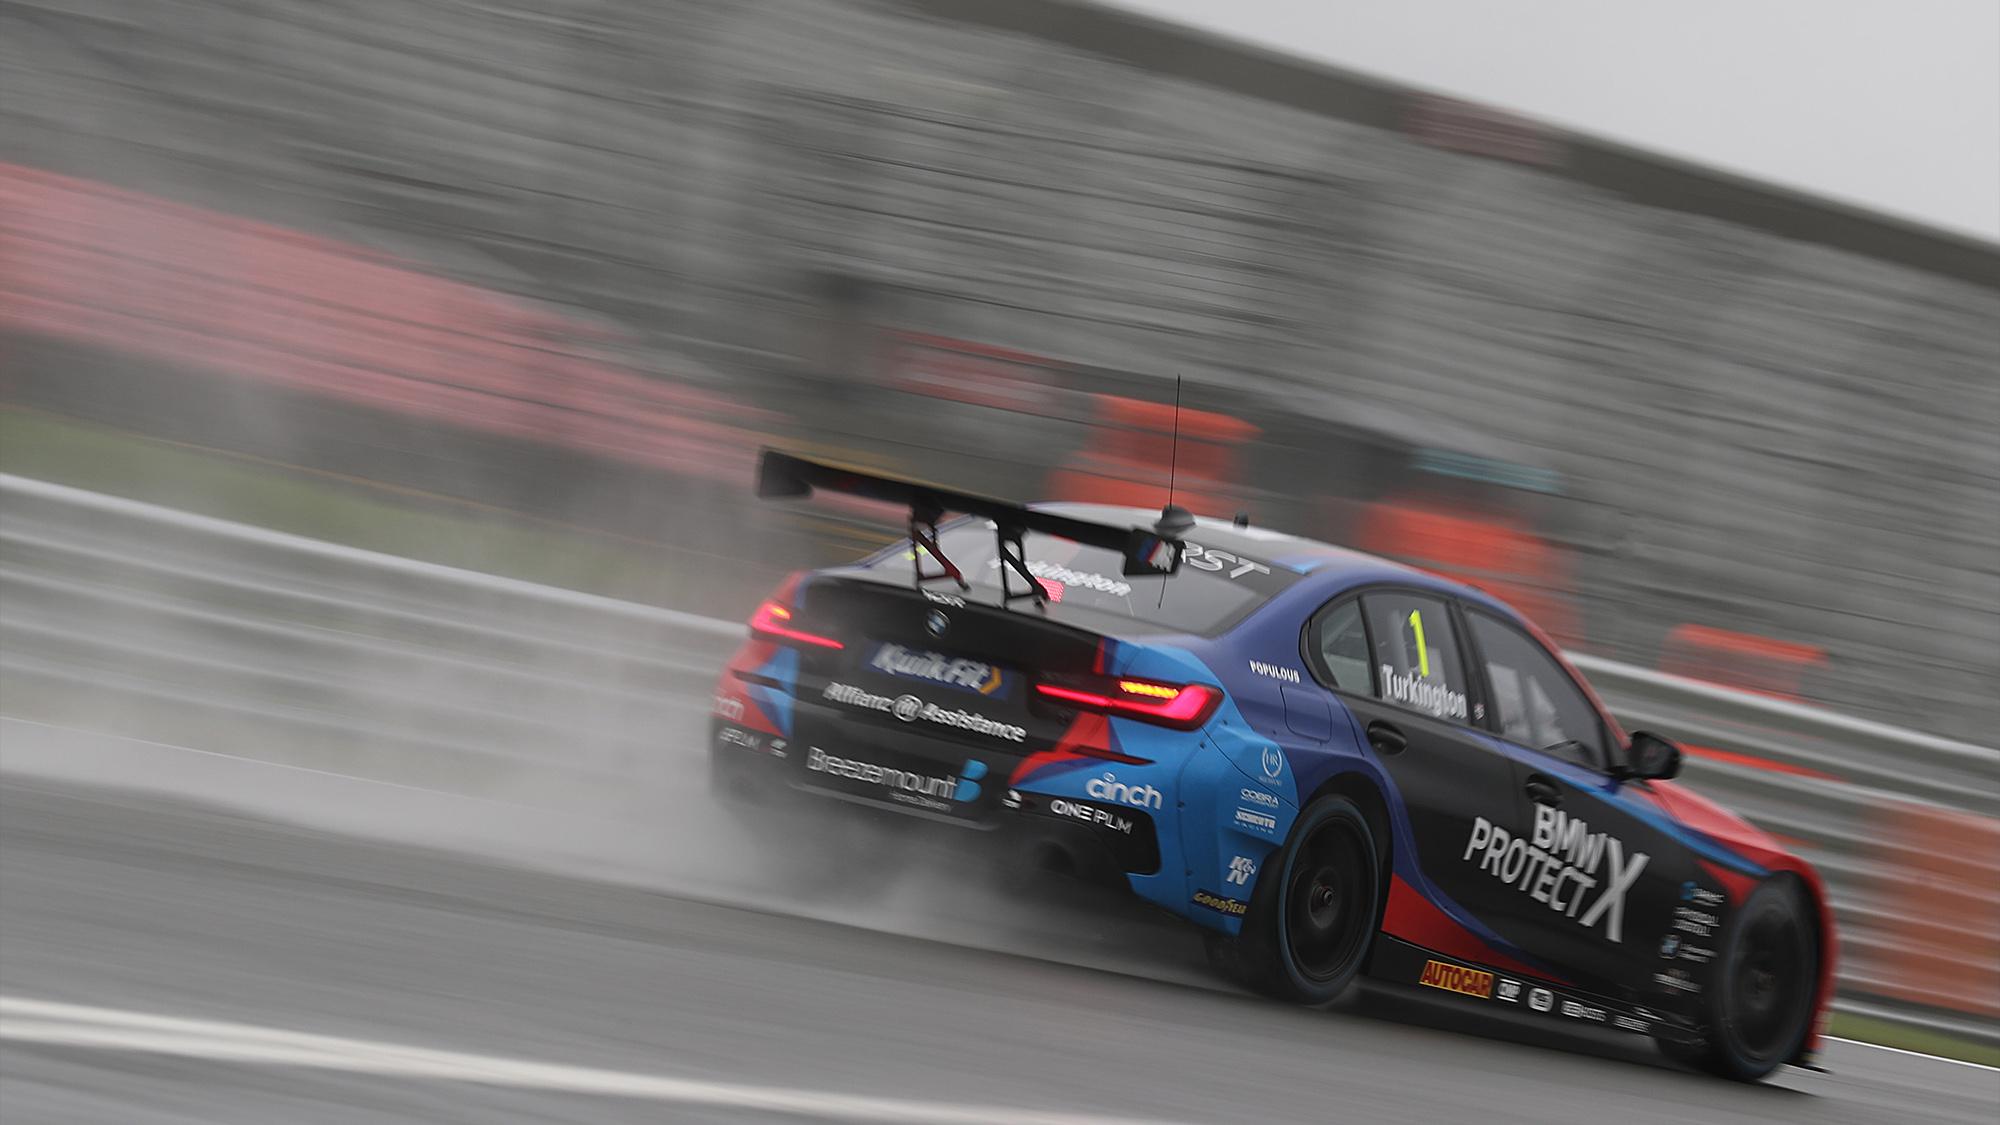 Colin Turkington's BMW creates a trail of spray at Brands Hatch in the 2020 BTCC